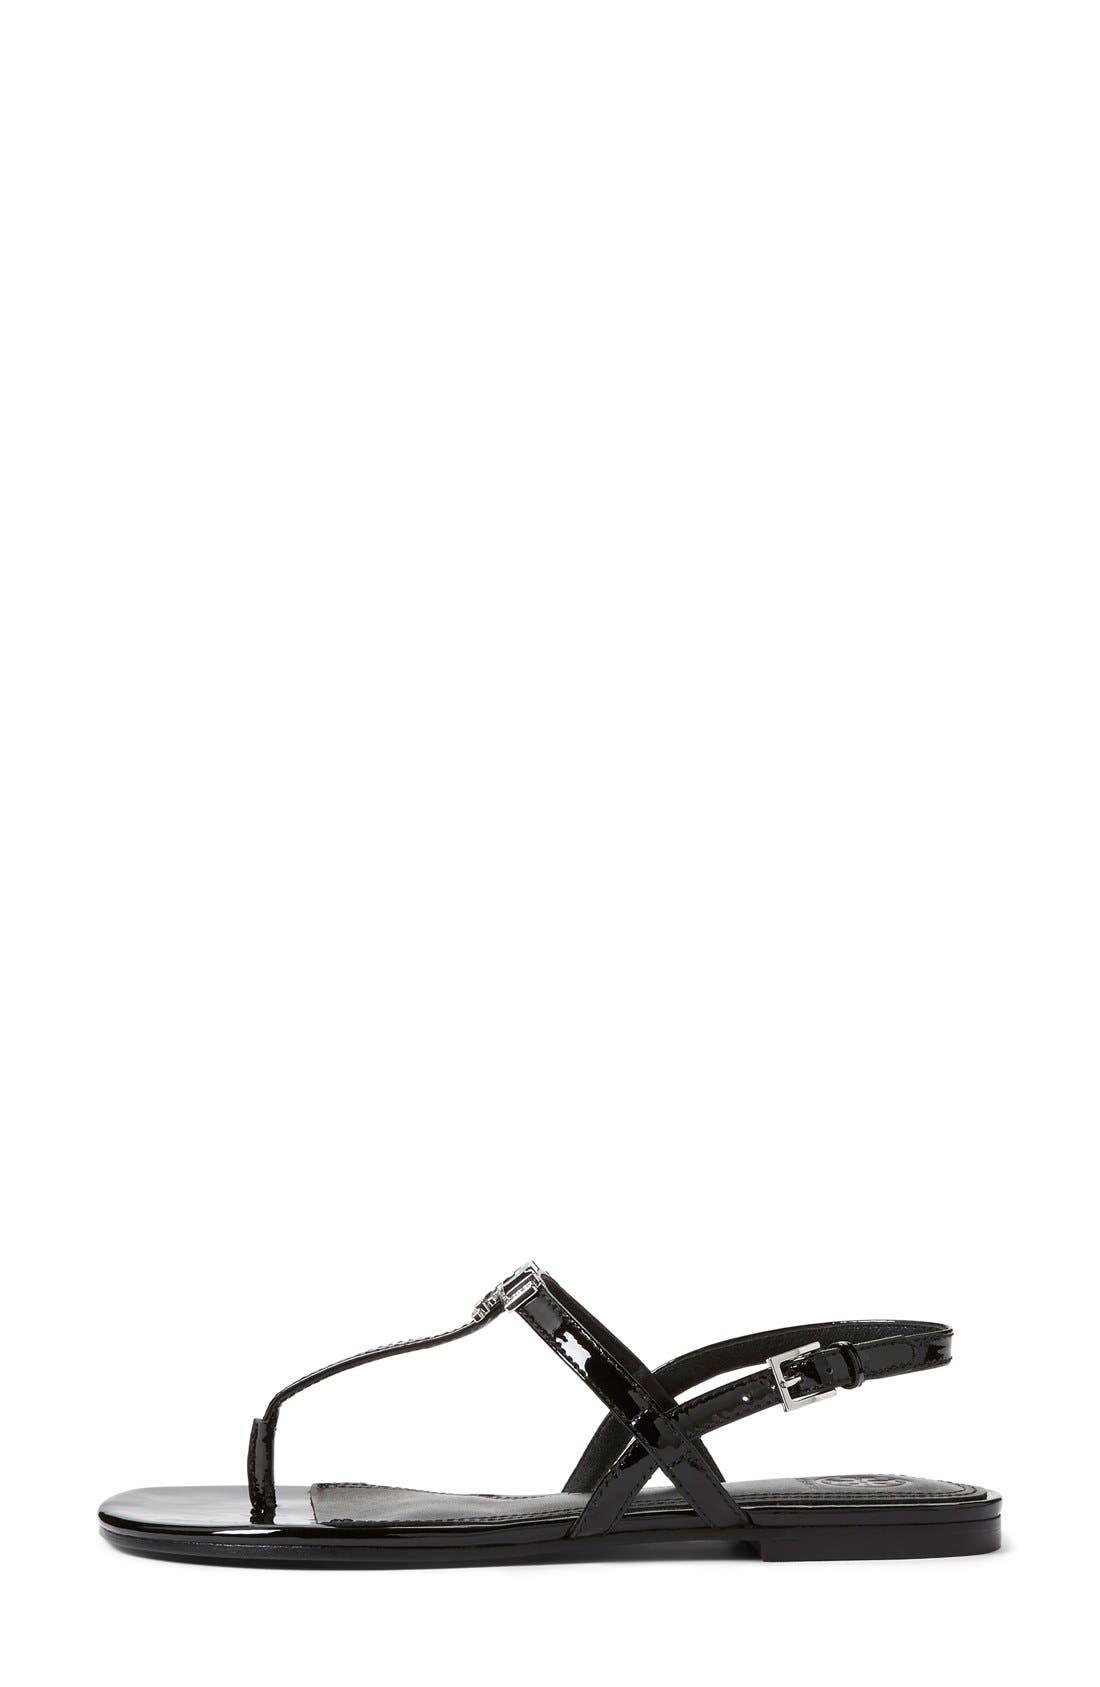 'Kieran' Sandal,                             Alternate thumbnail 4, color,                             001